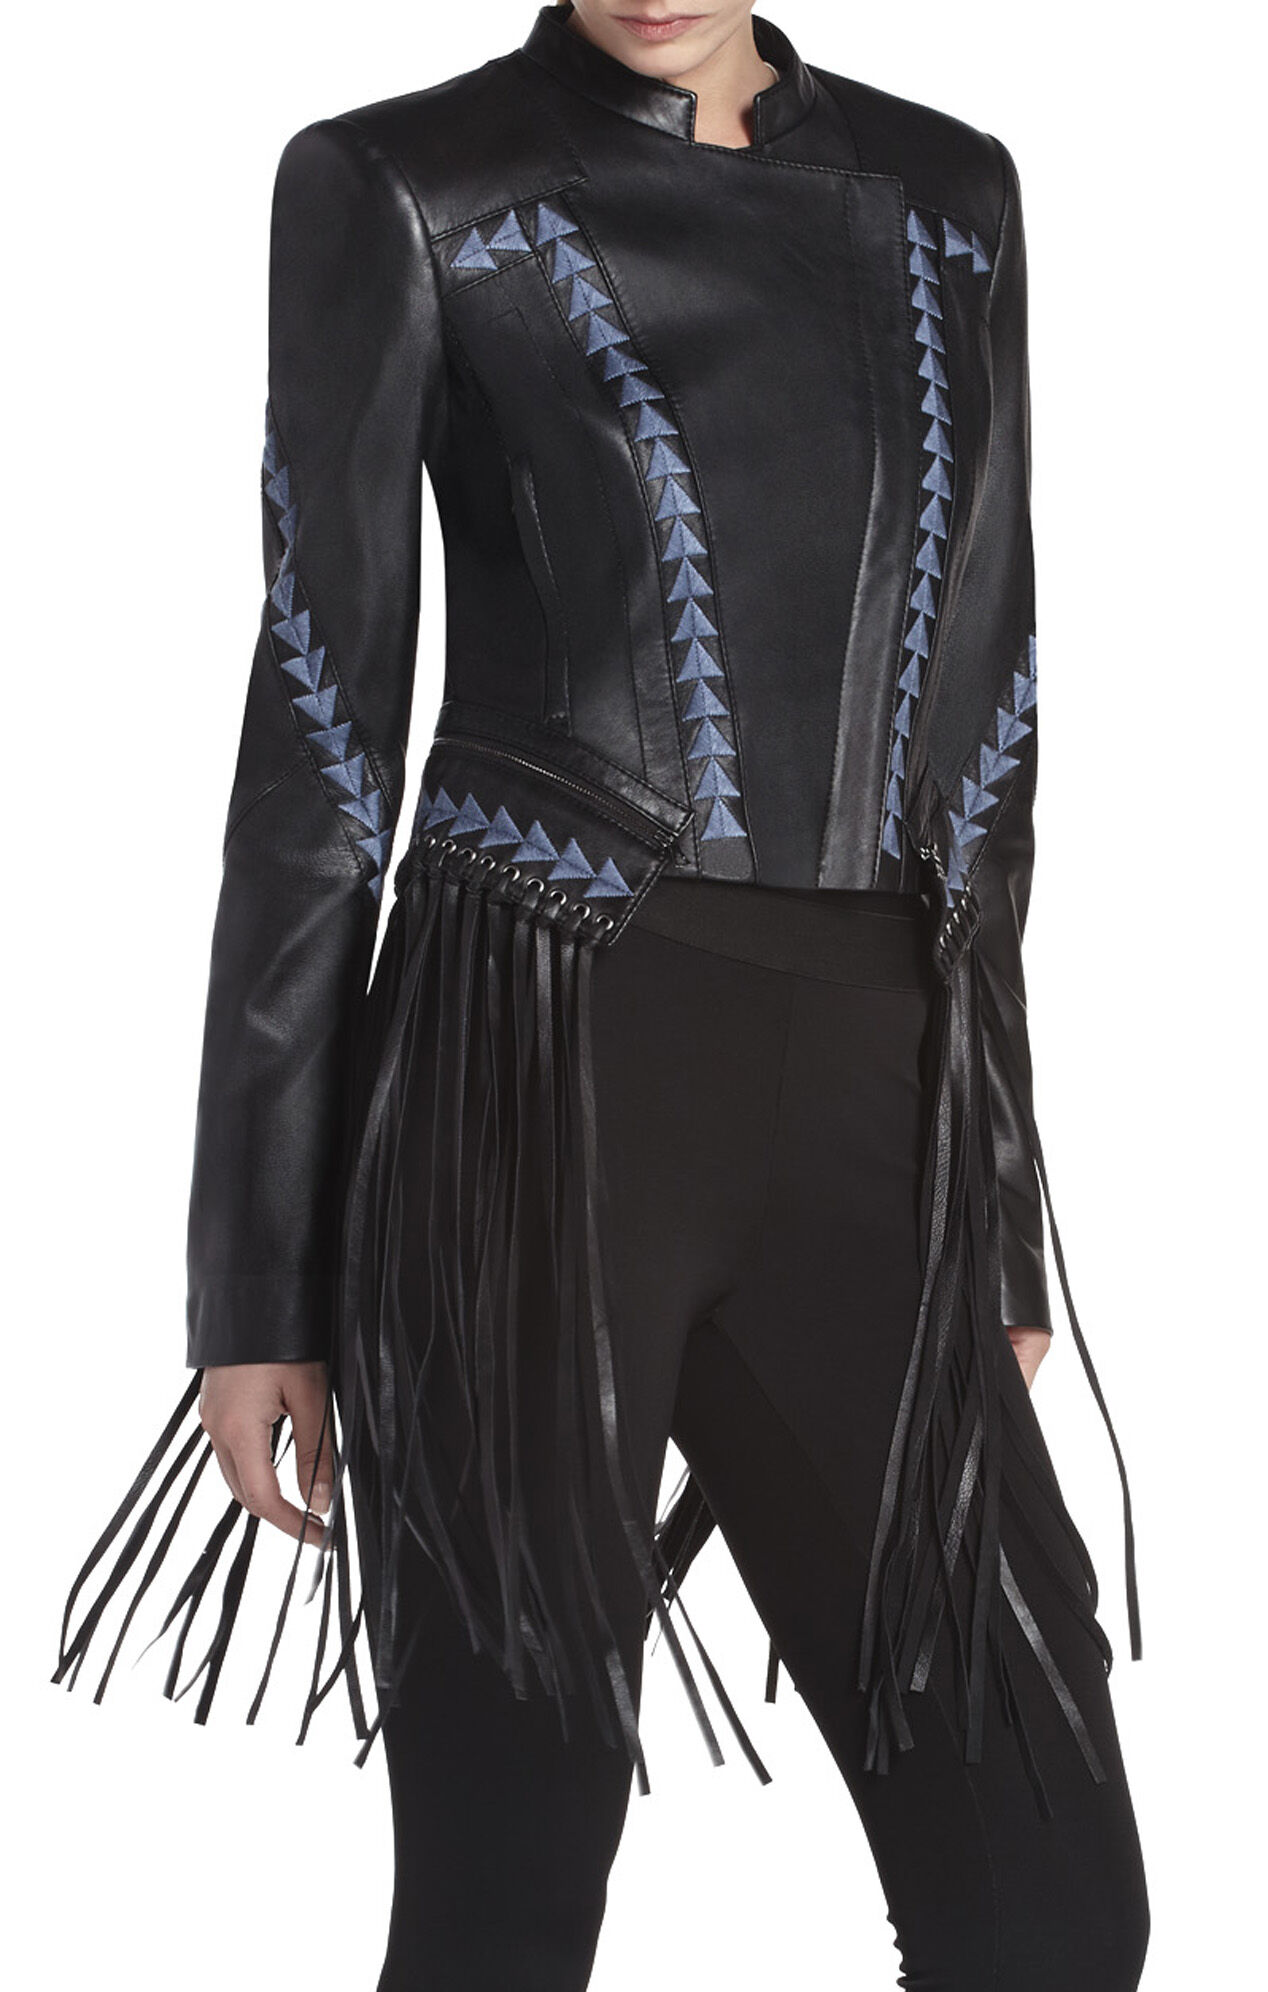 Leather jacket with fringe - Grant Fringed Leather Jacket Hover To Zoom